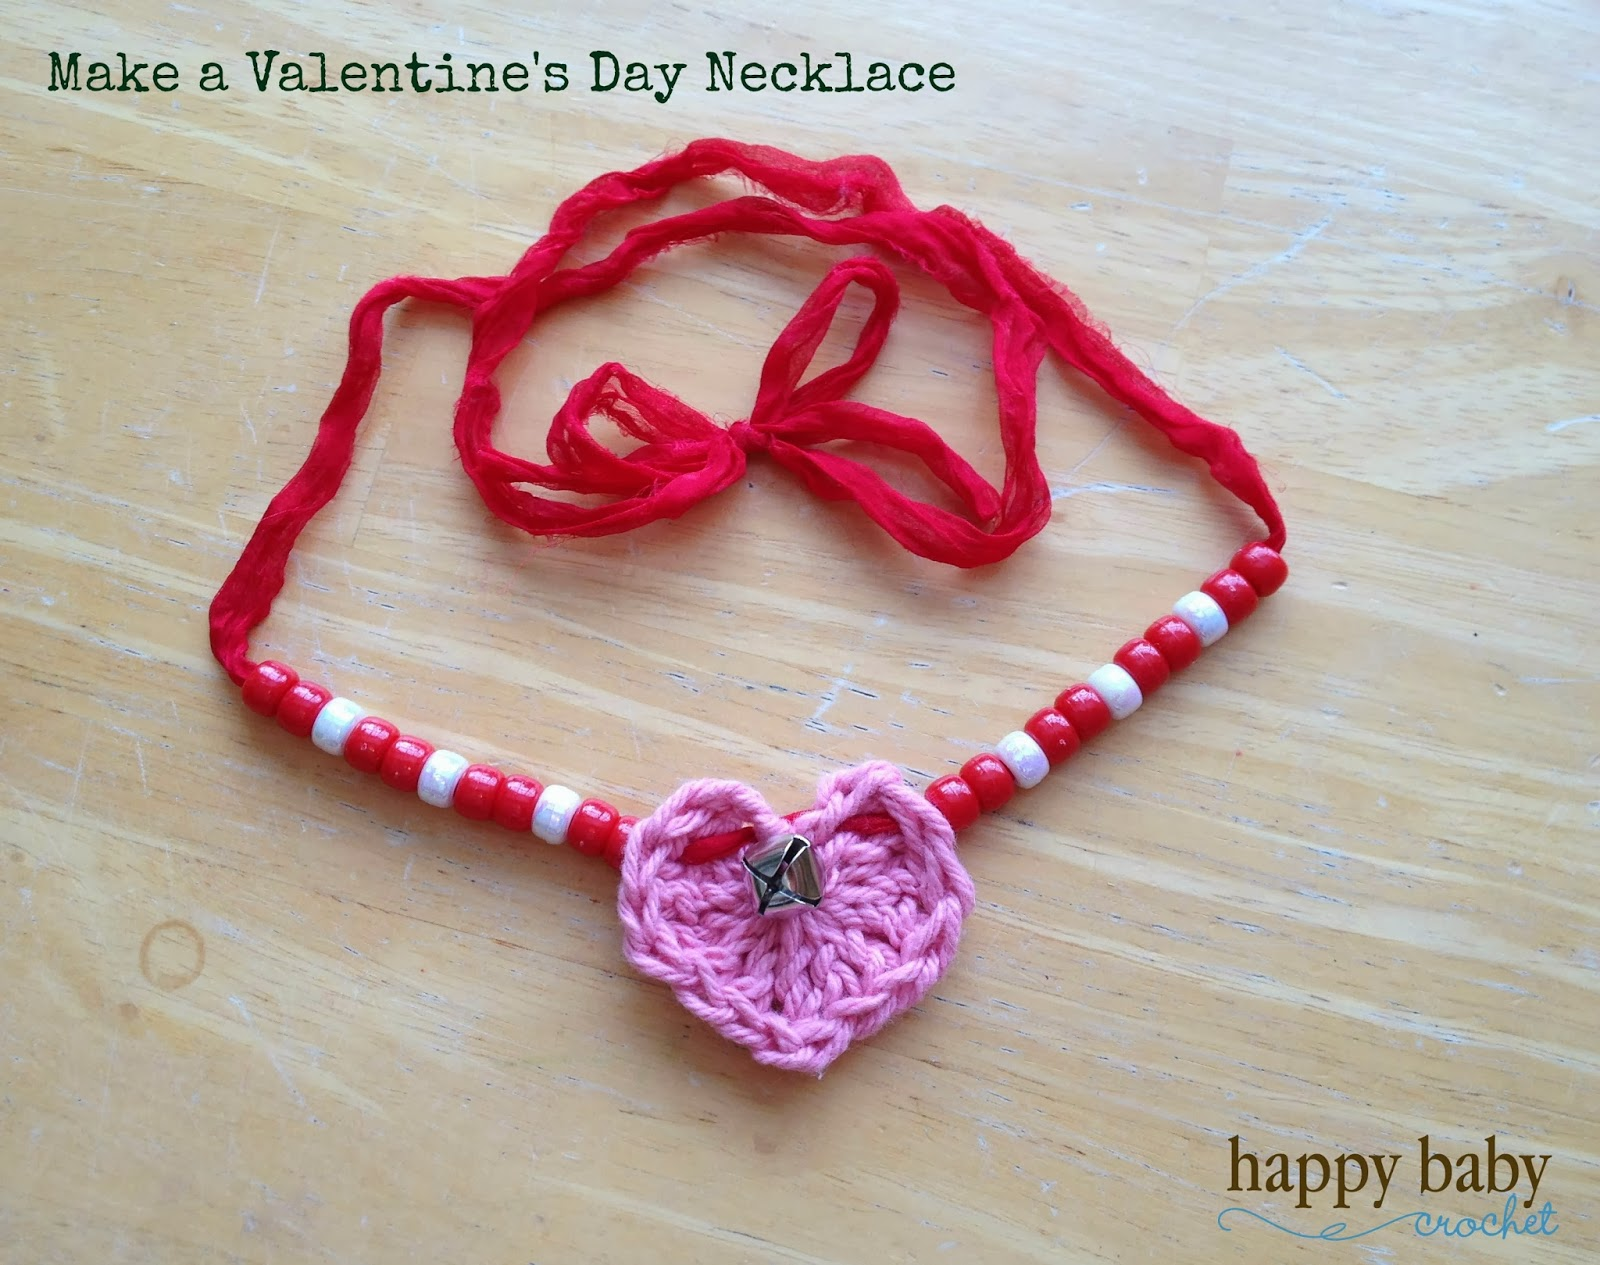 http://www.happybabycrochet.com/2015/02/valentines-day-crochet-heart-necklace.html